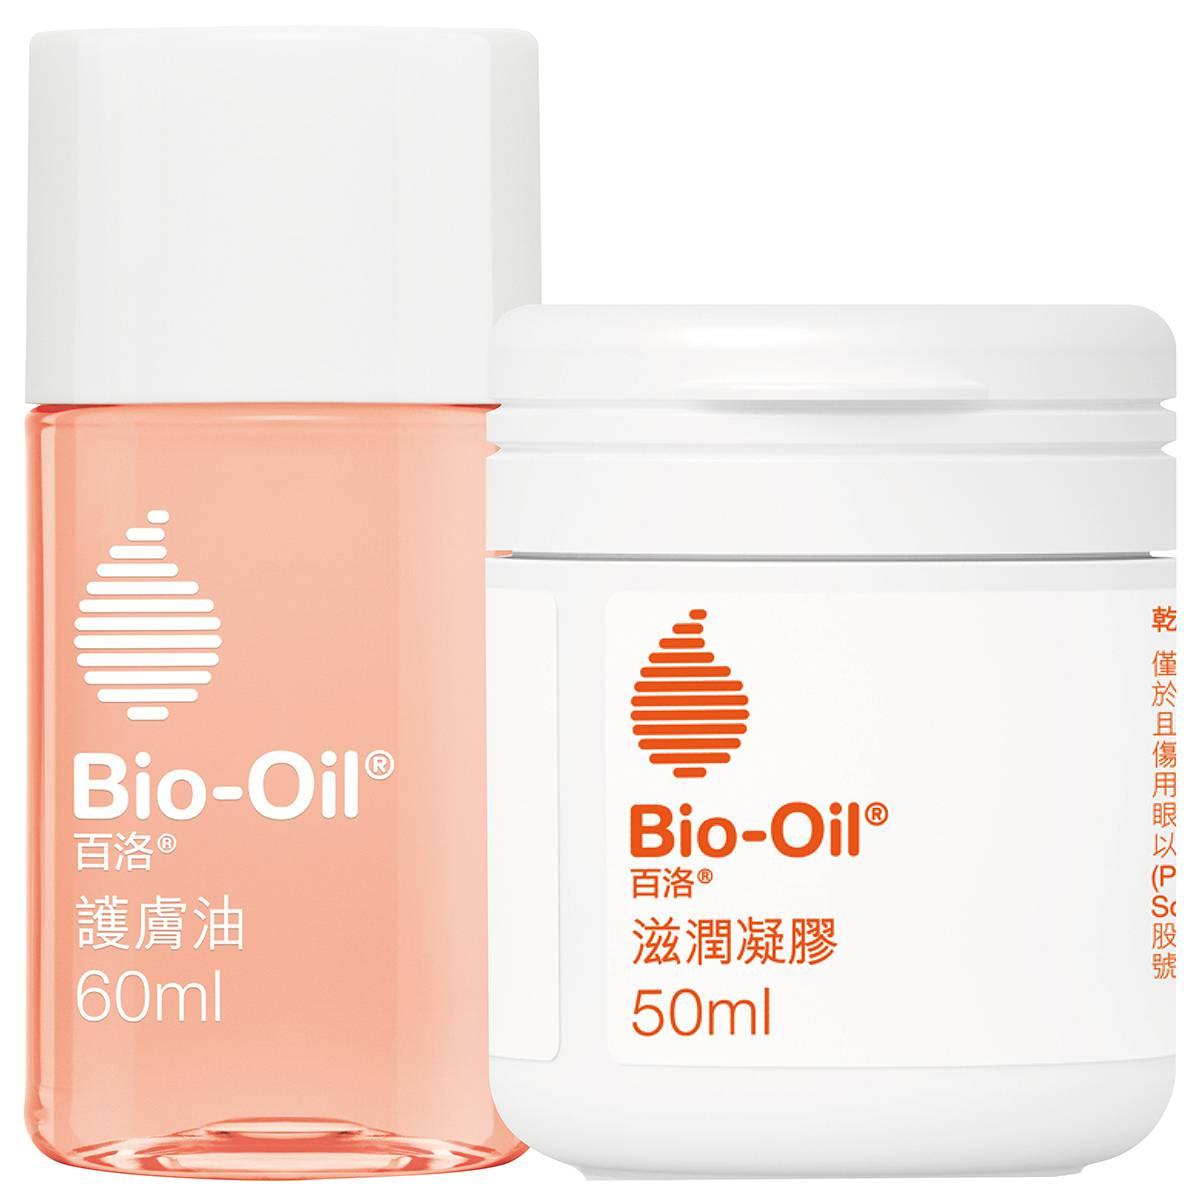 Bio-Oil百洛膠油雙入組( 百洛油60ml+百洛凝膠50ml)【康是美】